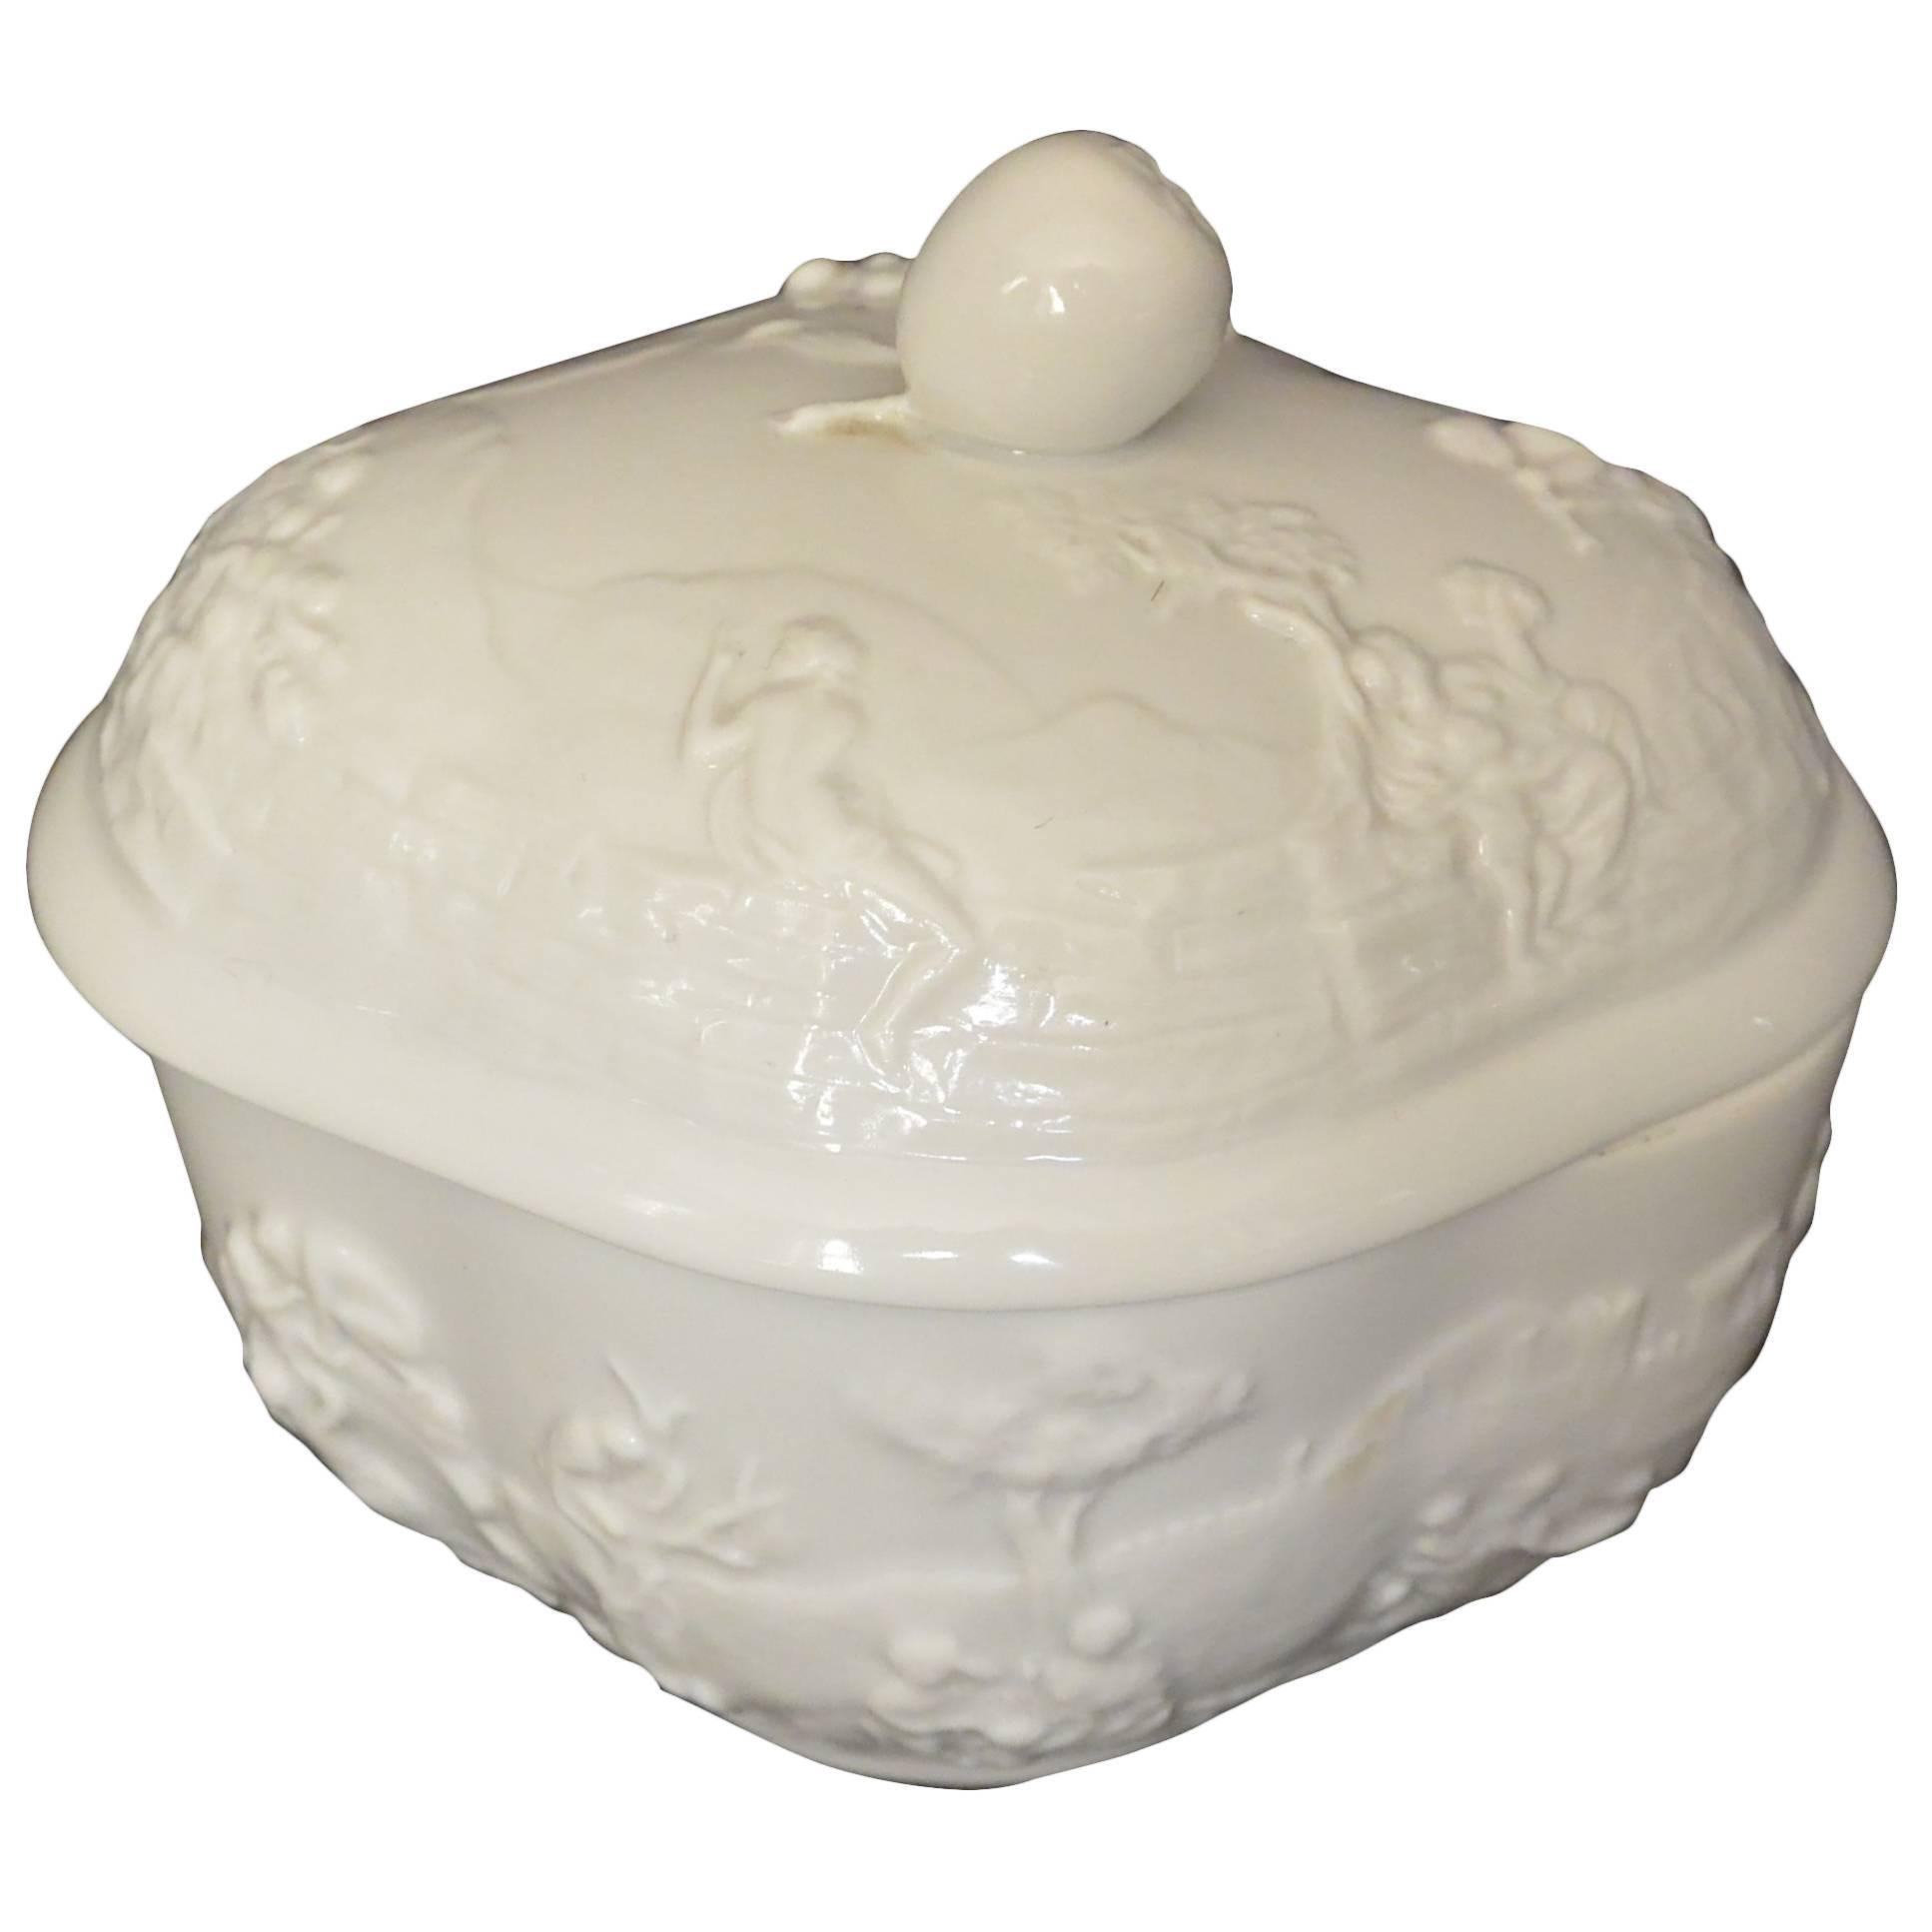 Capodimonte Porcelain Box